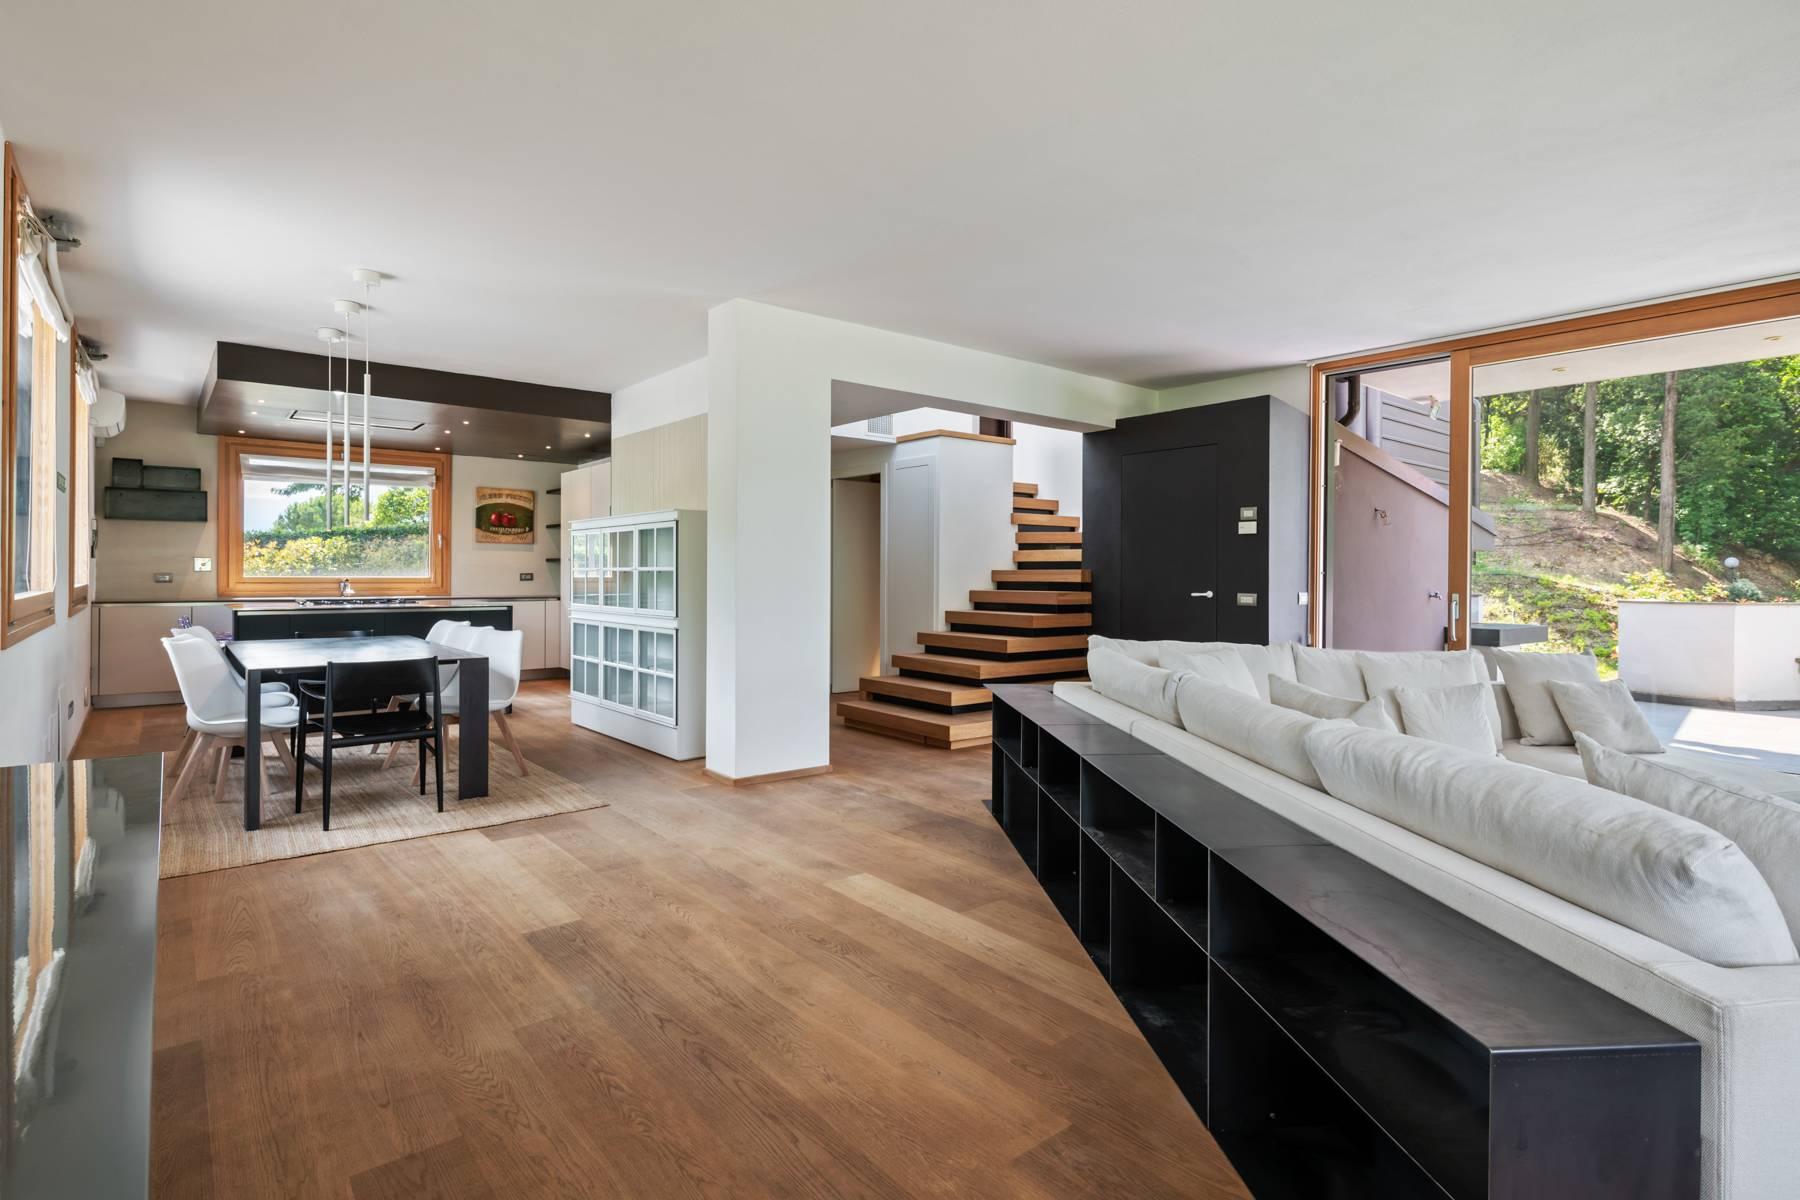 Appartamento in Vendita a Pontassieve: 5 locali, 300 mq - Foto 2